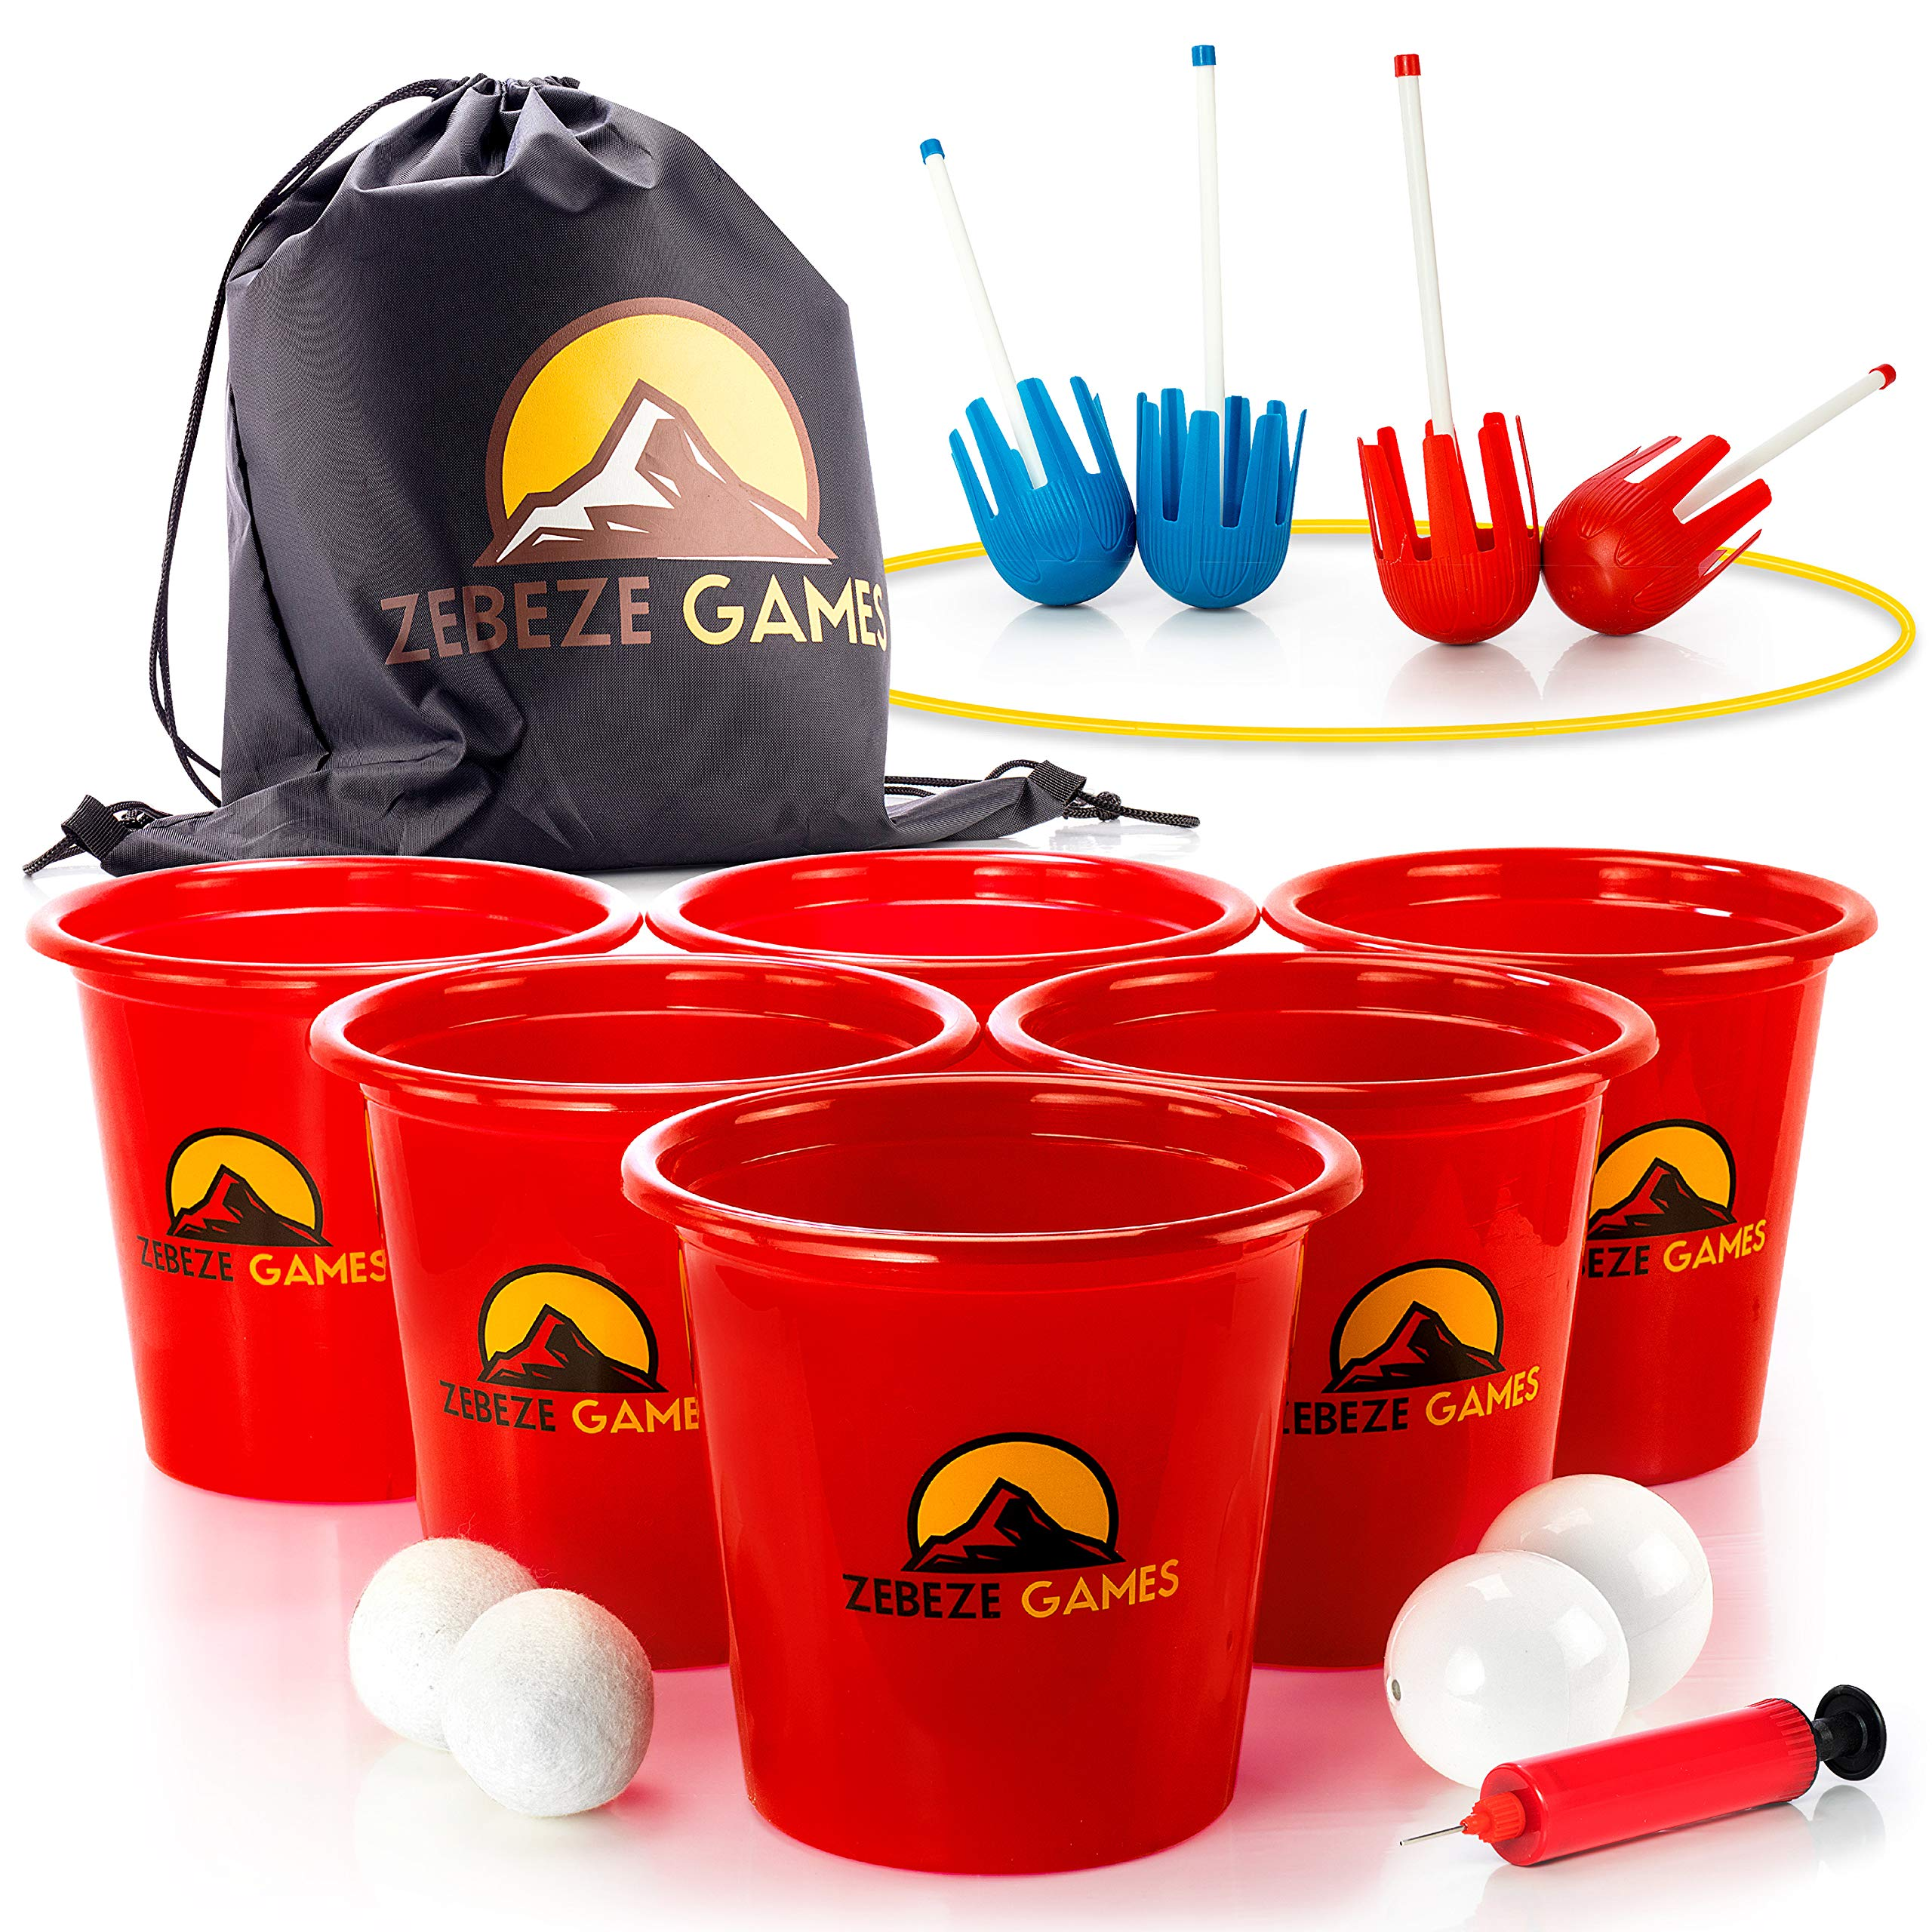 Yard Pong Outdoor Games - Giant Pong Buckets & Balls Set - Giant Beach Ball- Premium Beer Golf for Family & Friends - Giant Buckets + Pump - Jumbo Size Yard Game & Bonus by ZEBEZE GAMES